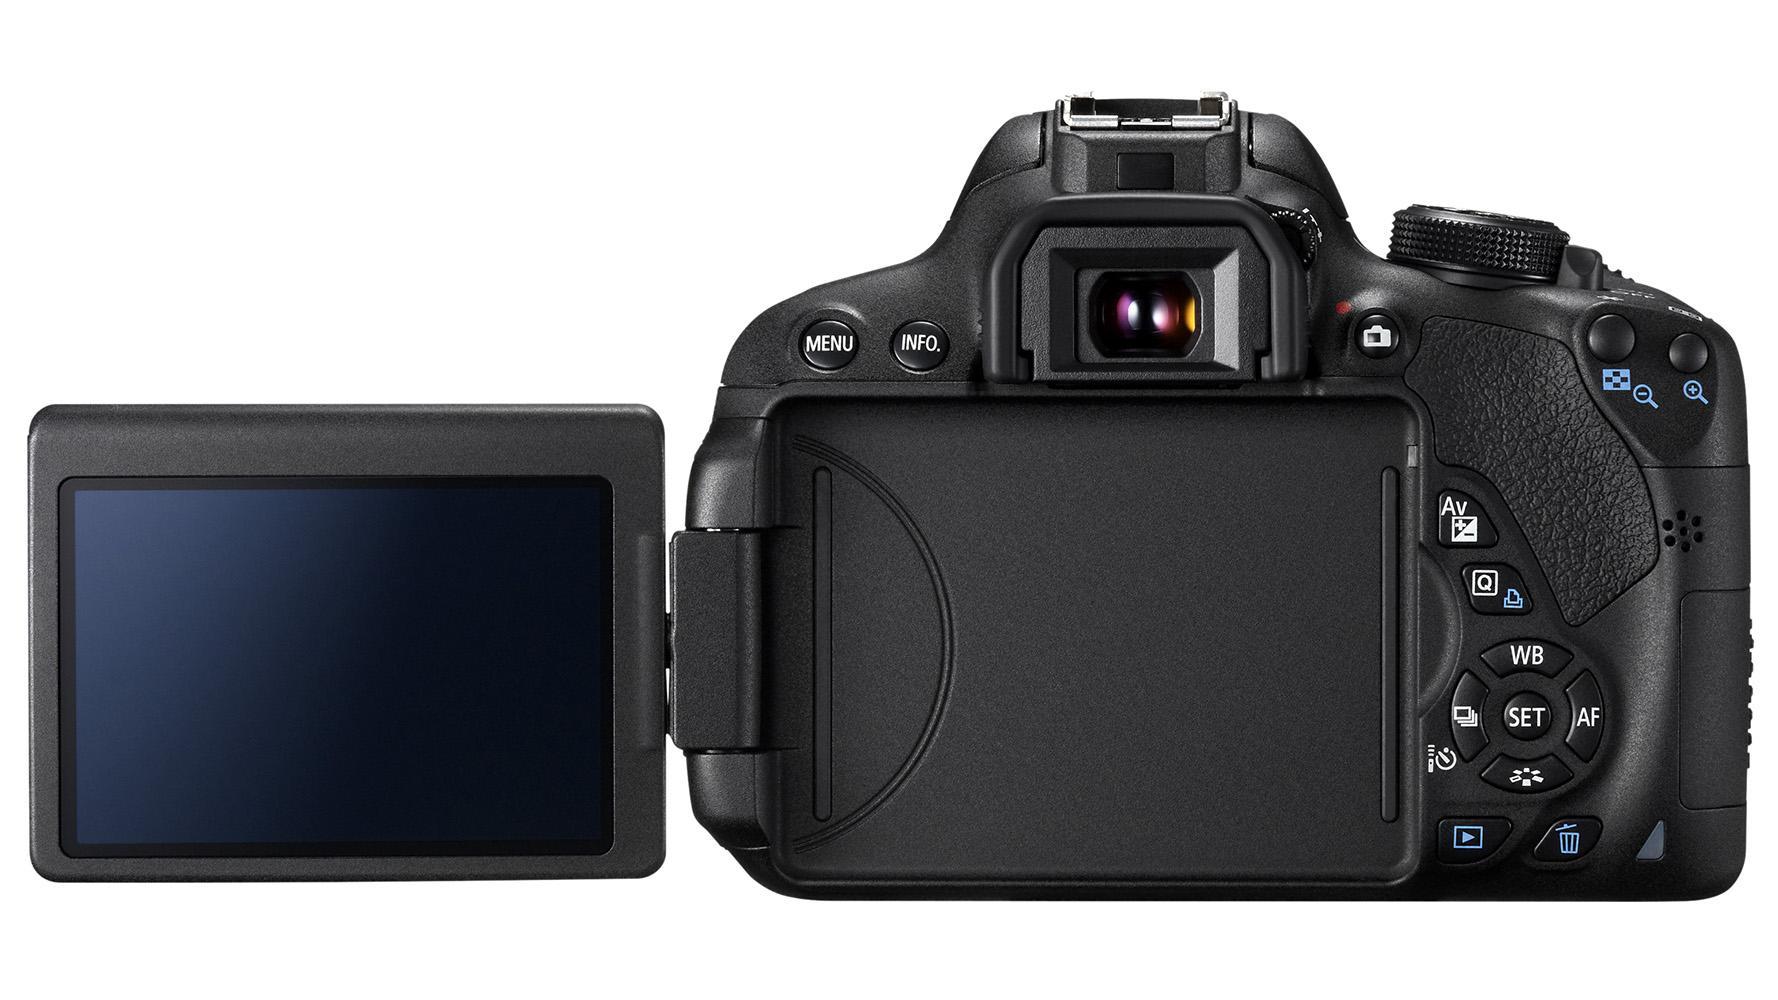 Canon EOS 700D review